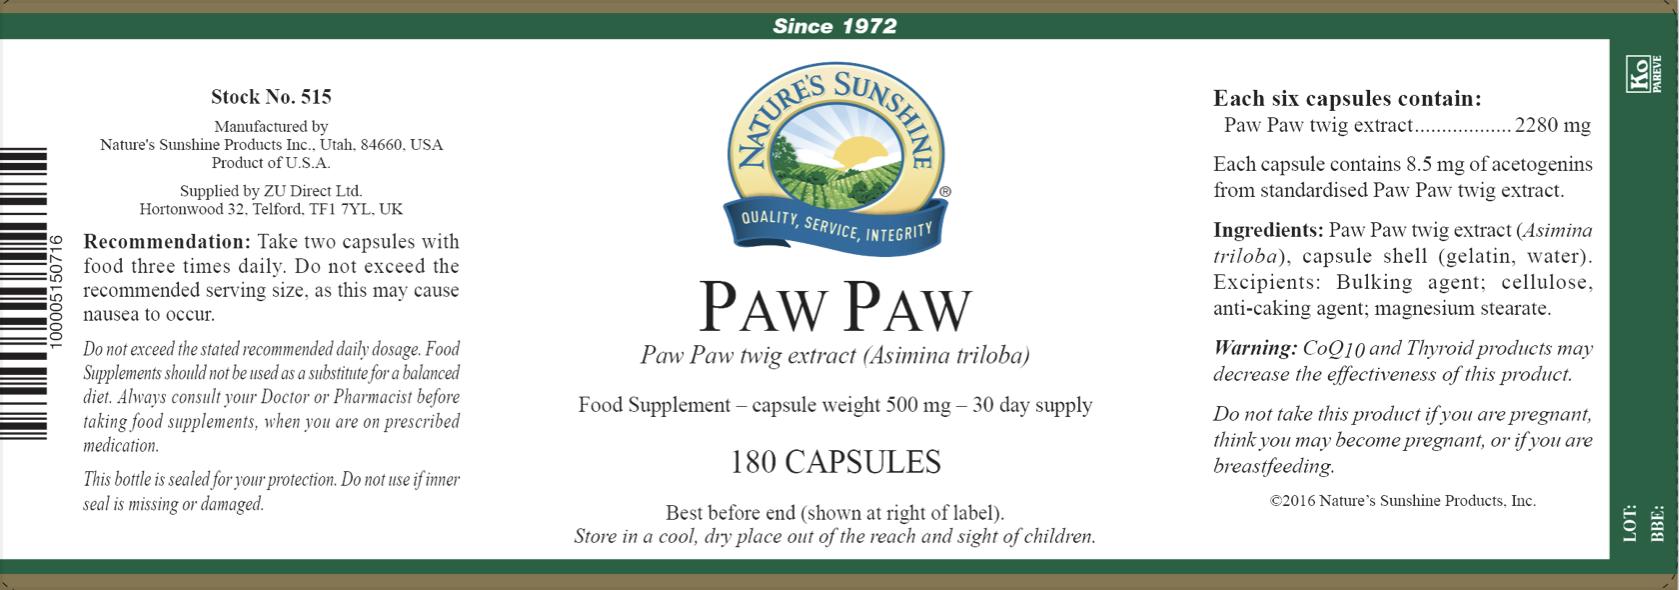 Nature's Sunshine - Paw Paw - Label